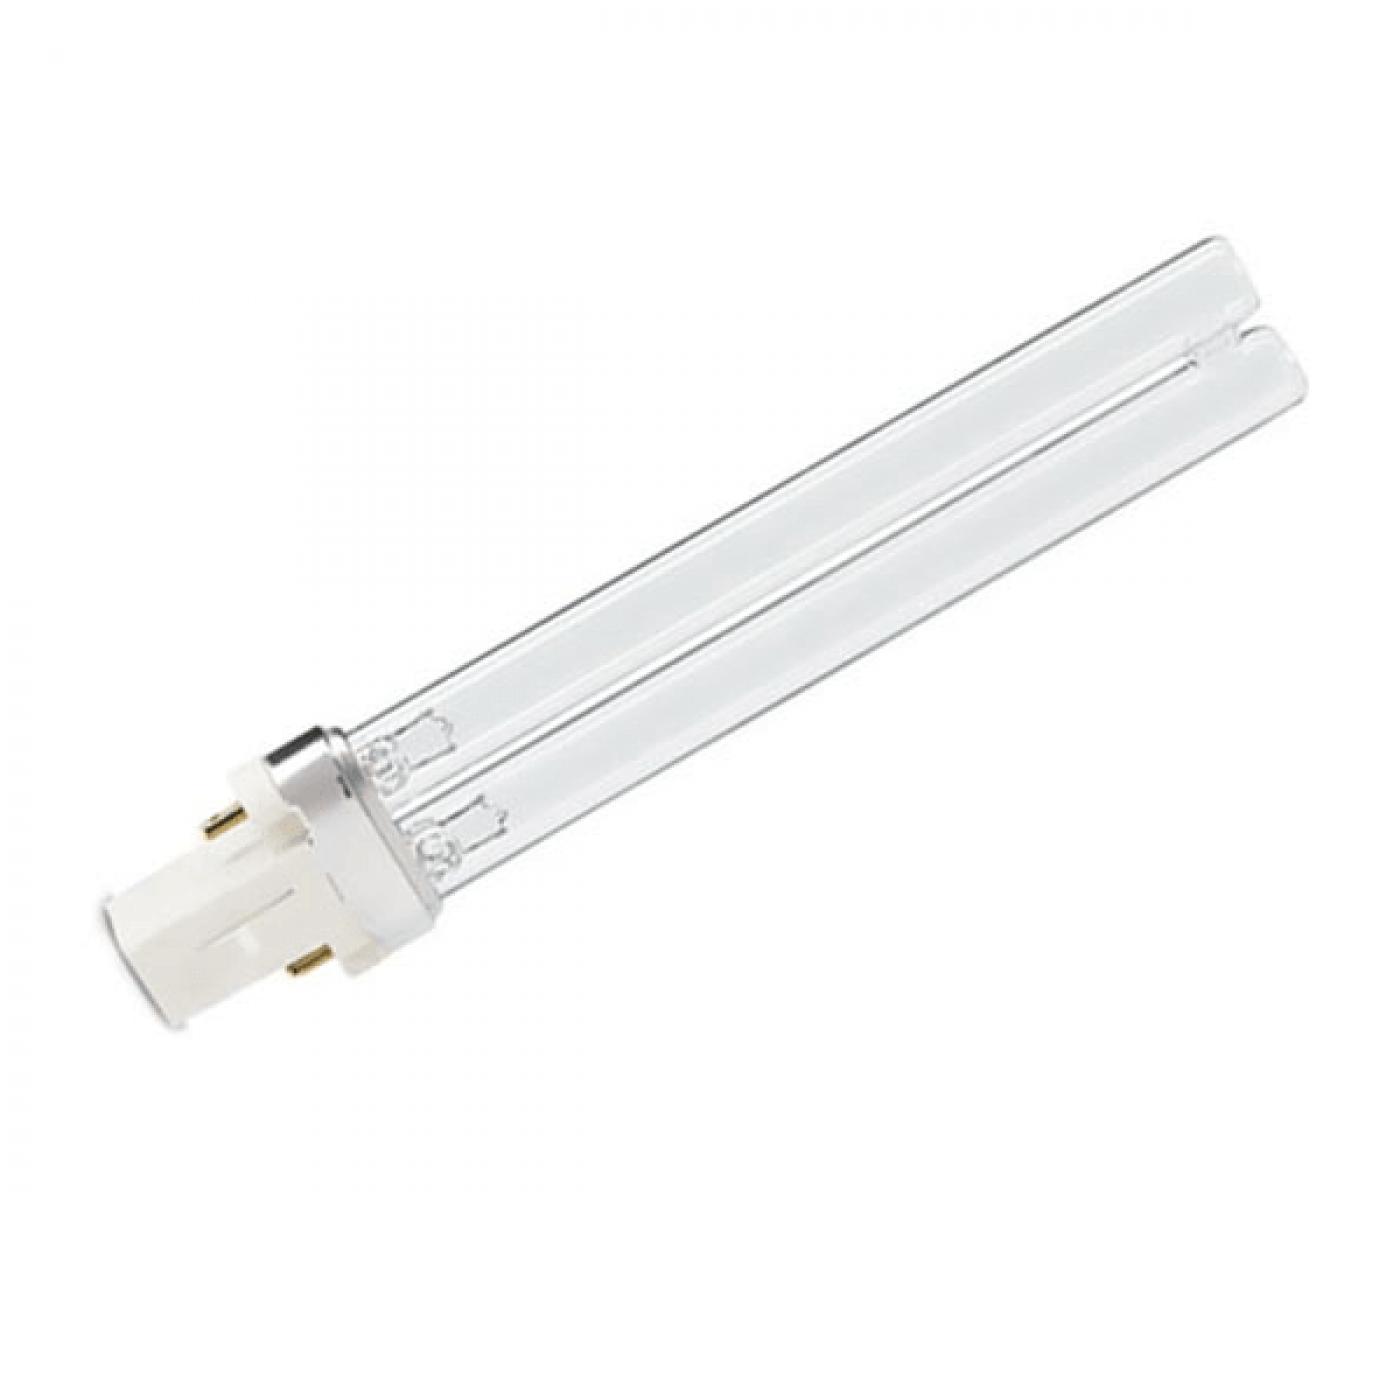 PHILIPS PL-S LAMPADA UV 11 WATT 2 PIN